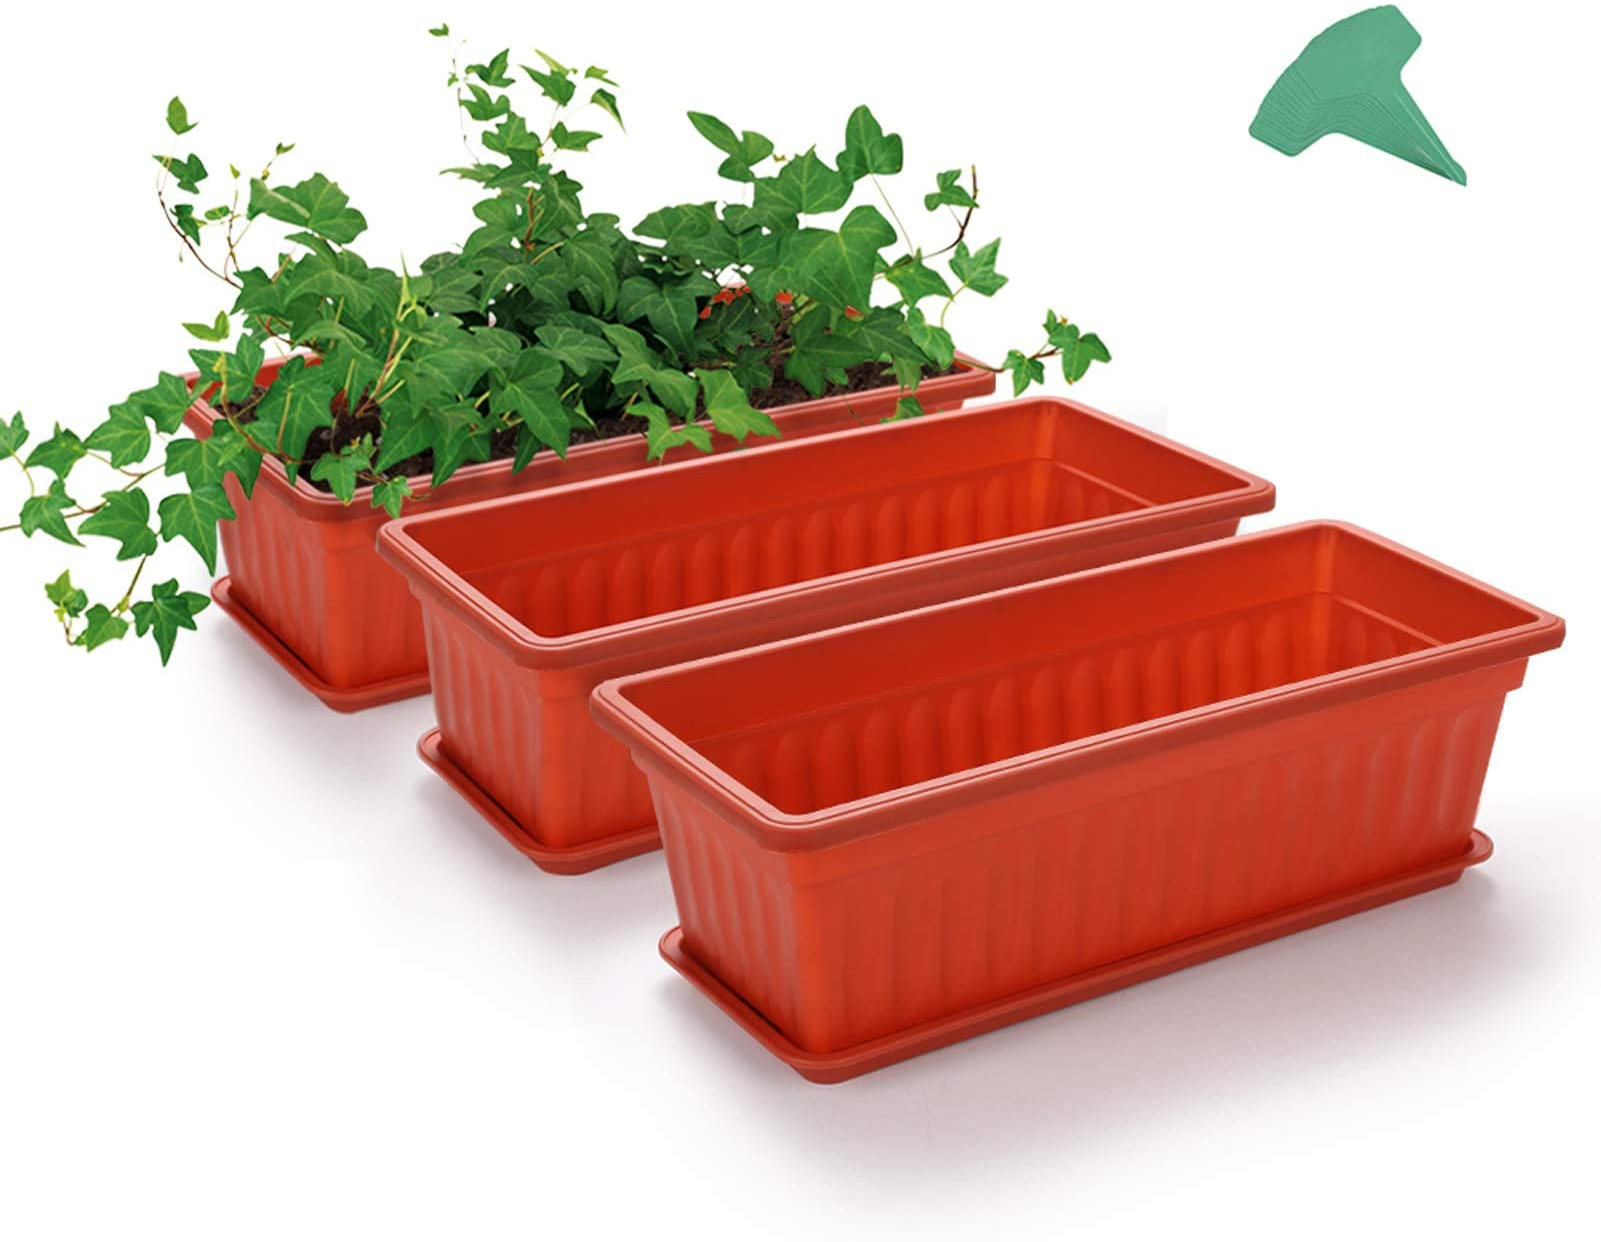 100 Small Plant Labels NOS Vintage Pink Plastic Garden Labels 3 Inch